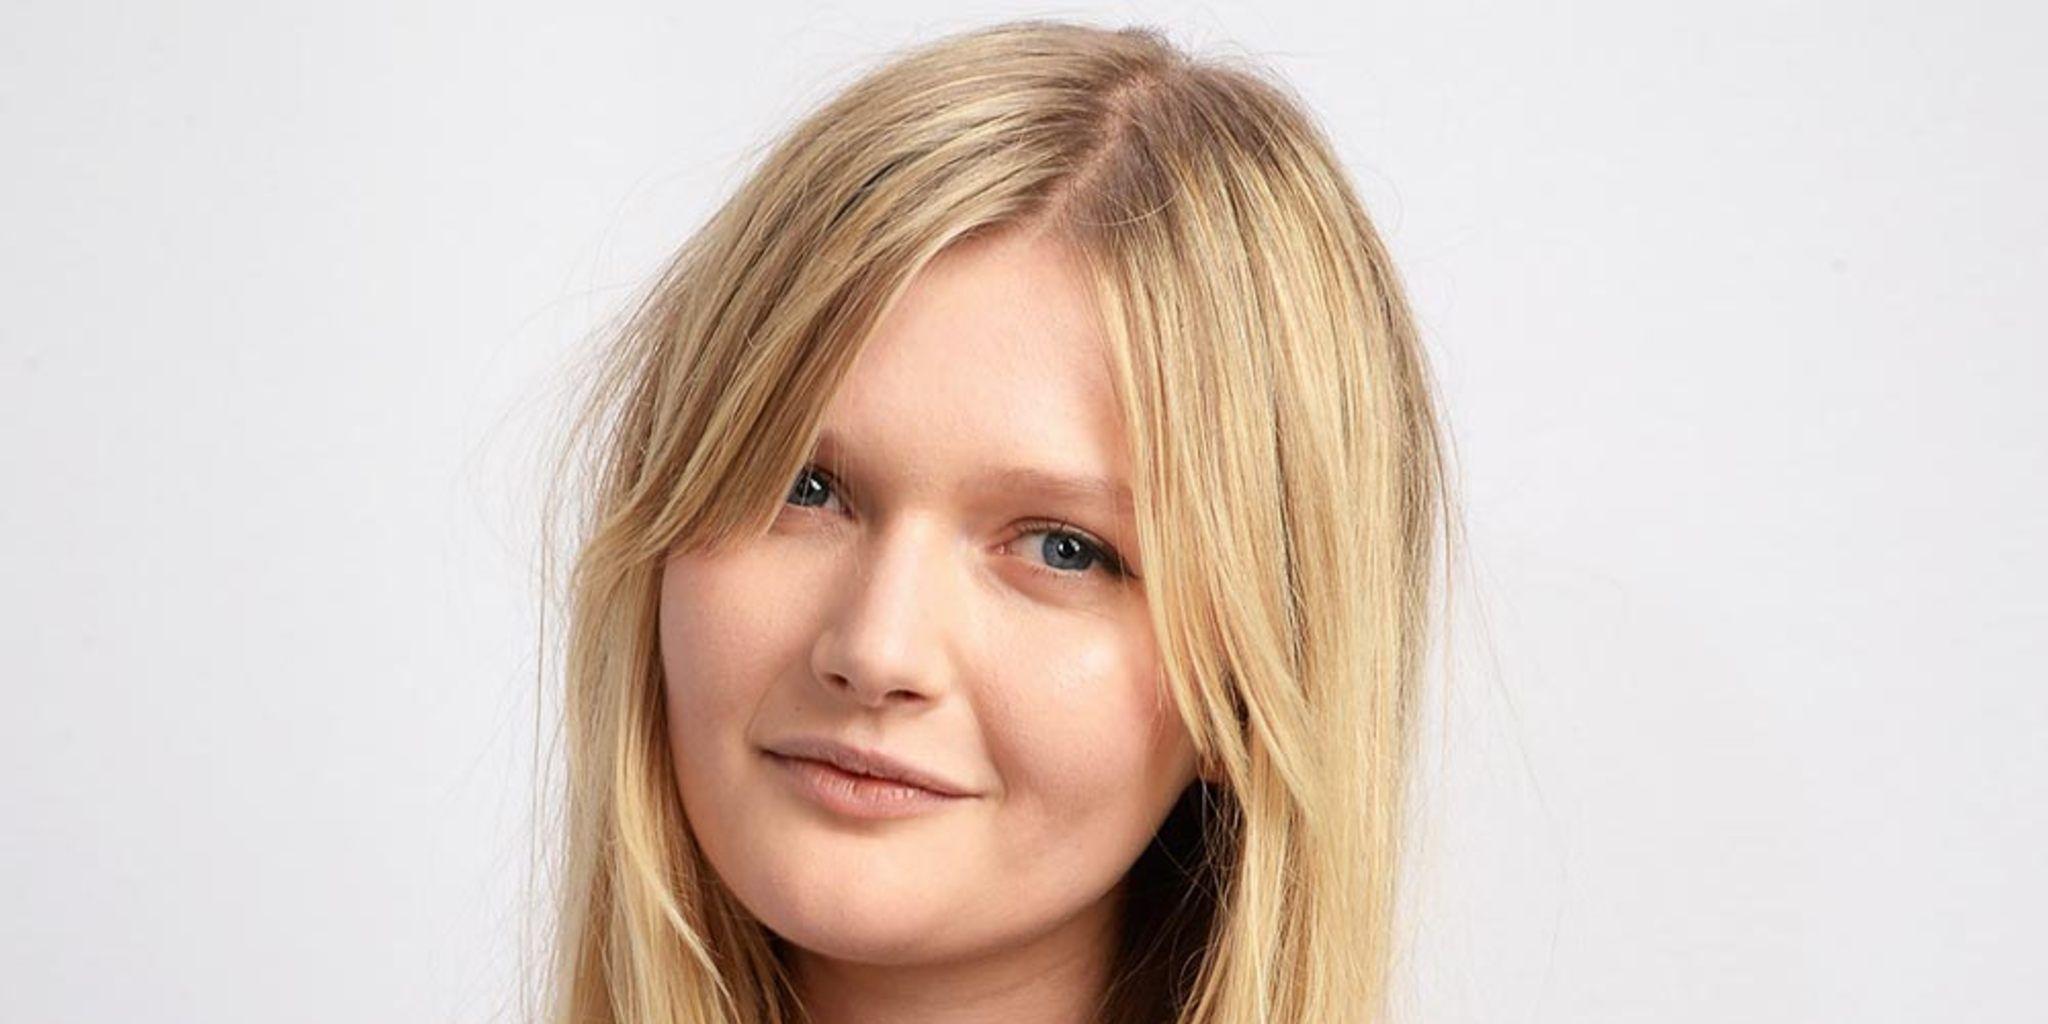 Sophie Kennedy Clark height